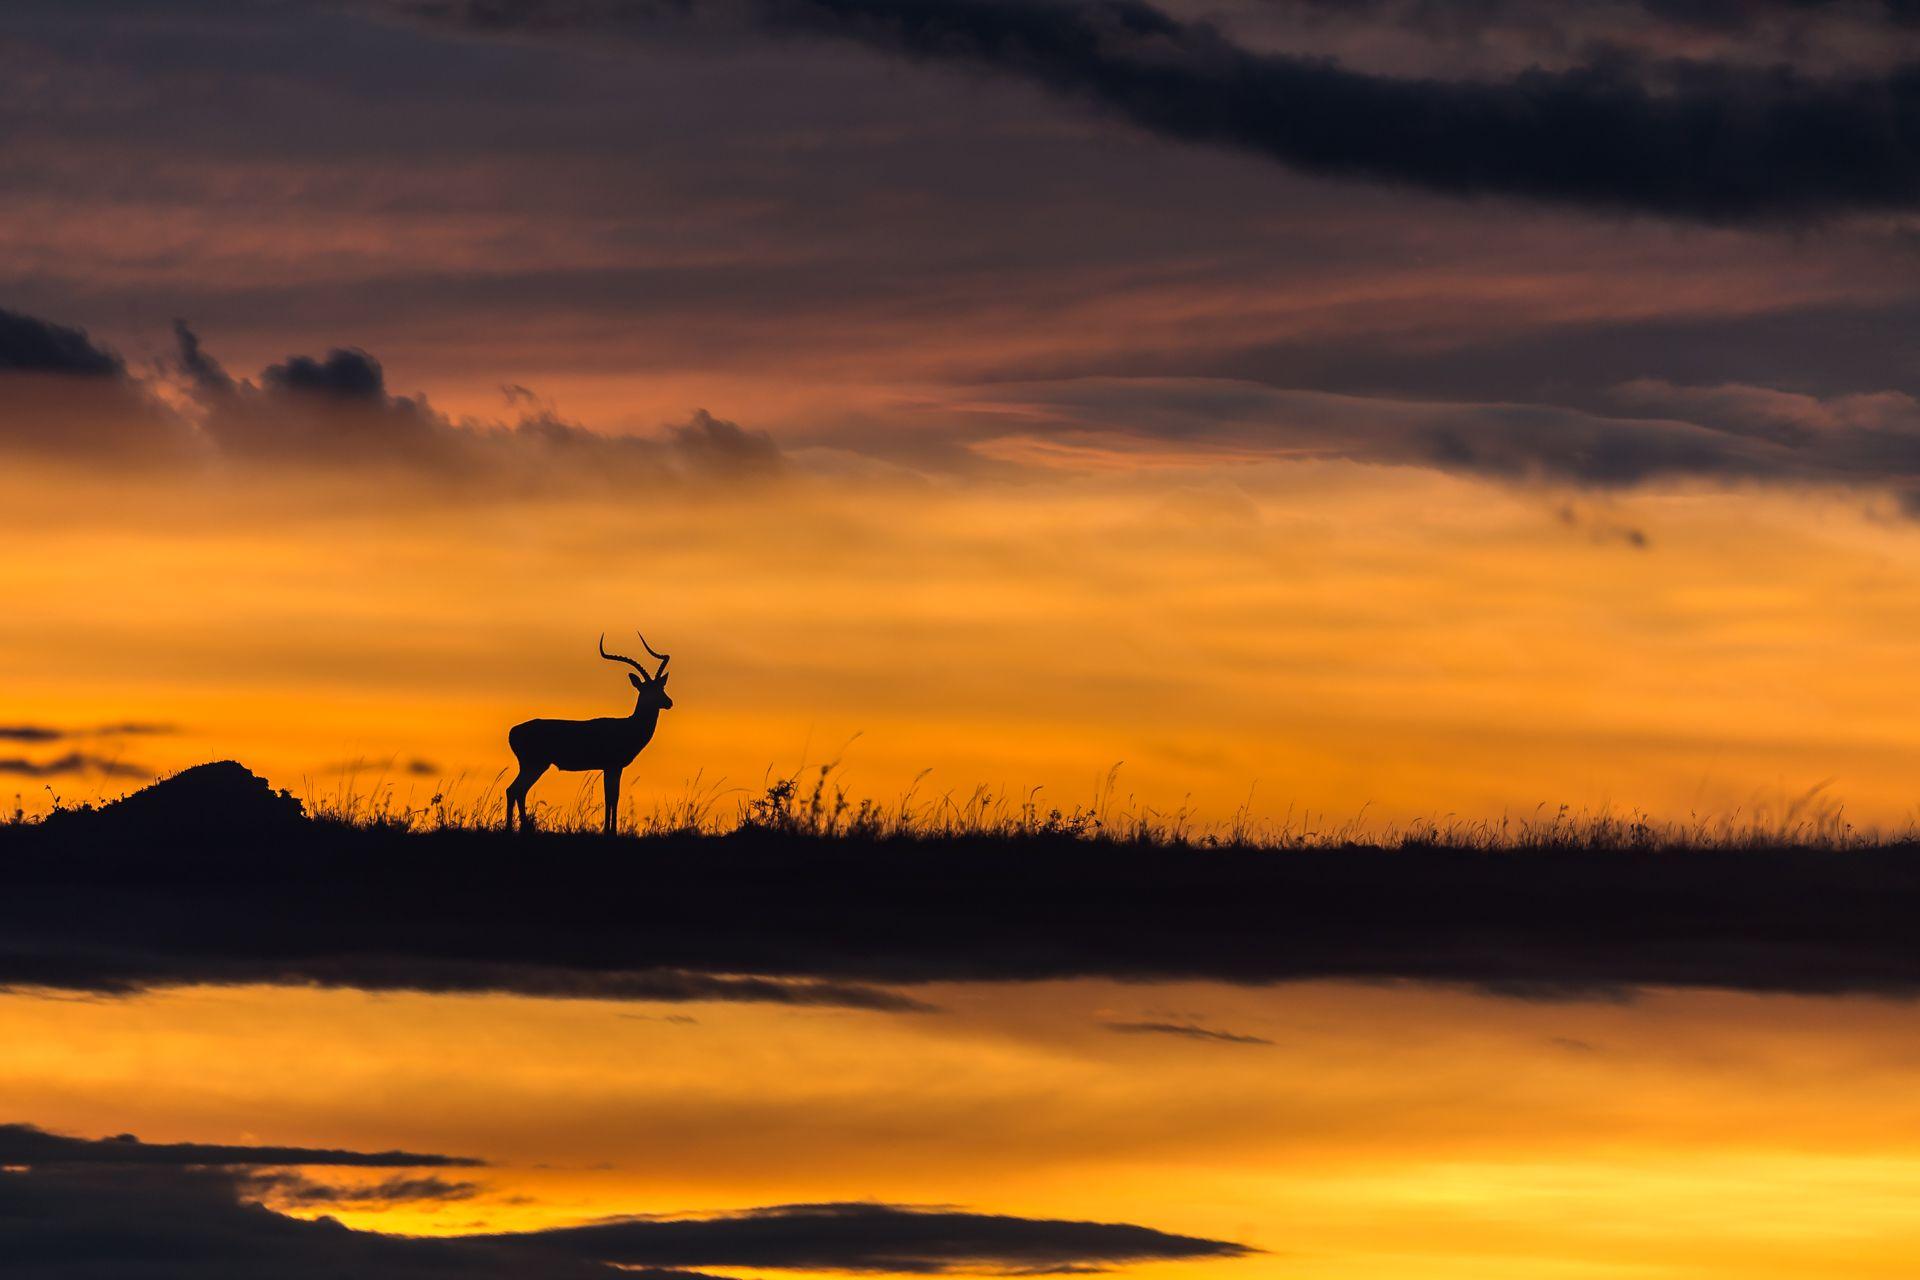 Impala Silhouette - Multiple Exposure